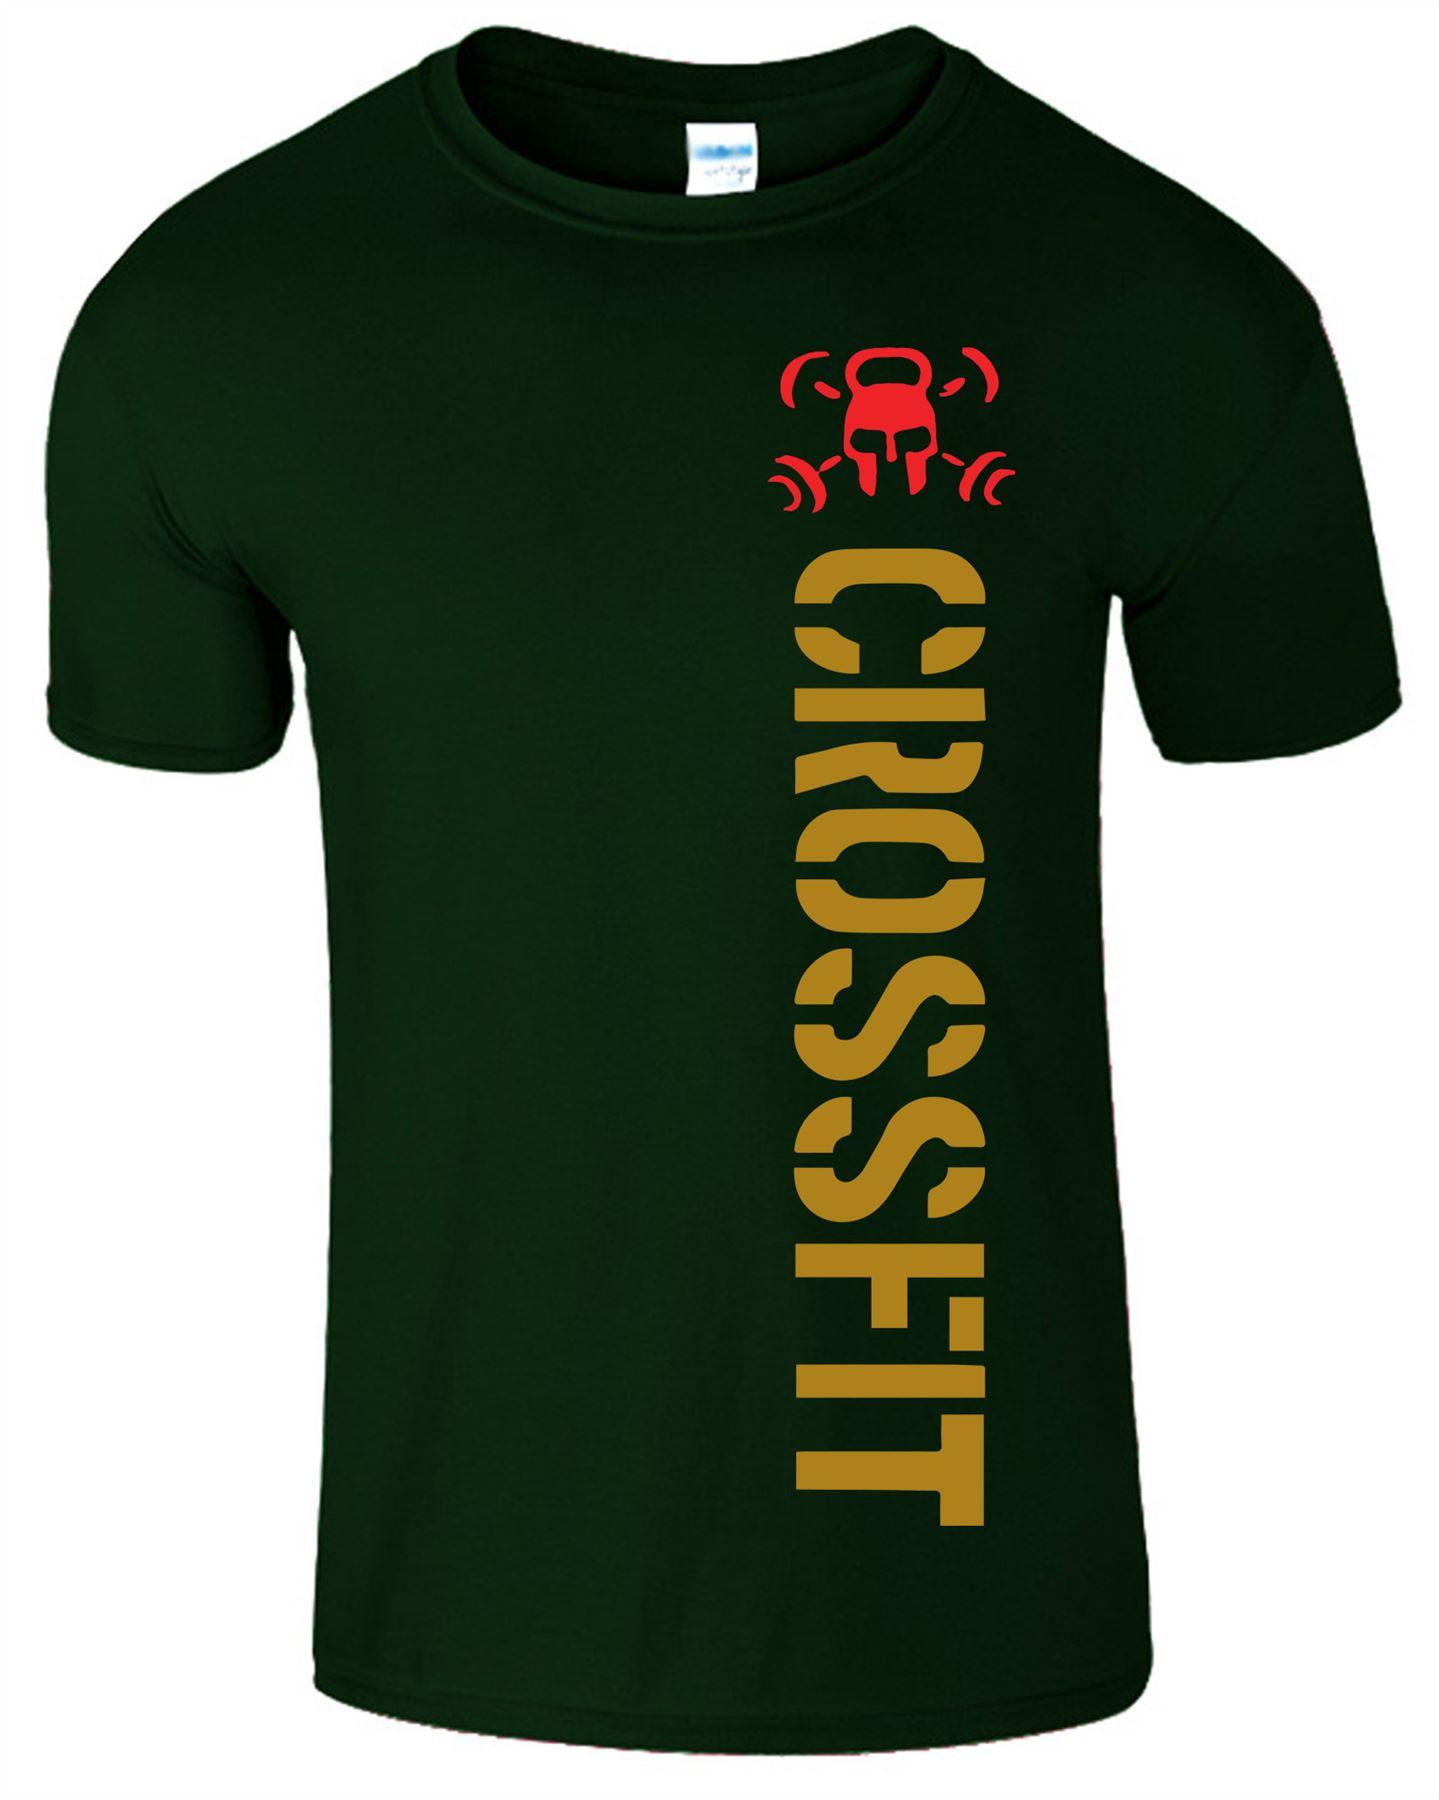 Crossfit-Mens-T-Shirt-Gym-Wear-Bodybuilding-Training-Workout-Fitness-T-Shirt Indexbild 8